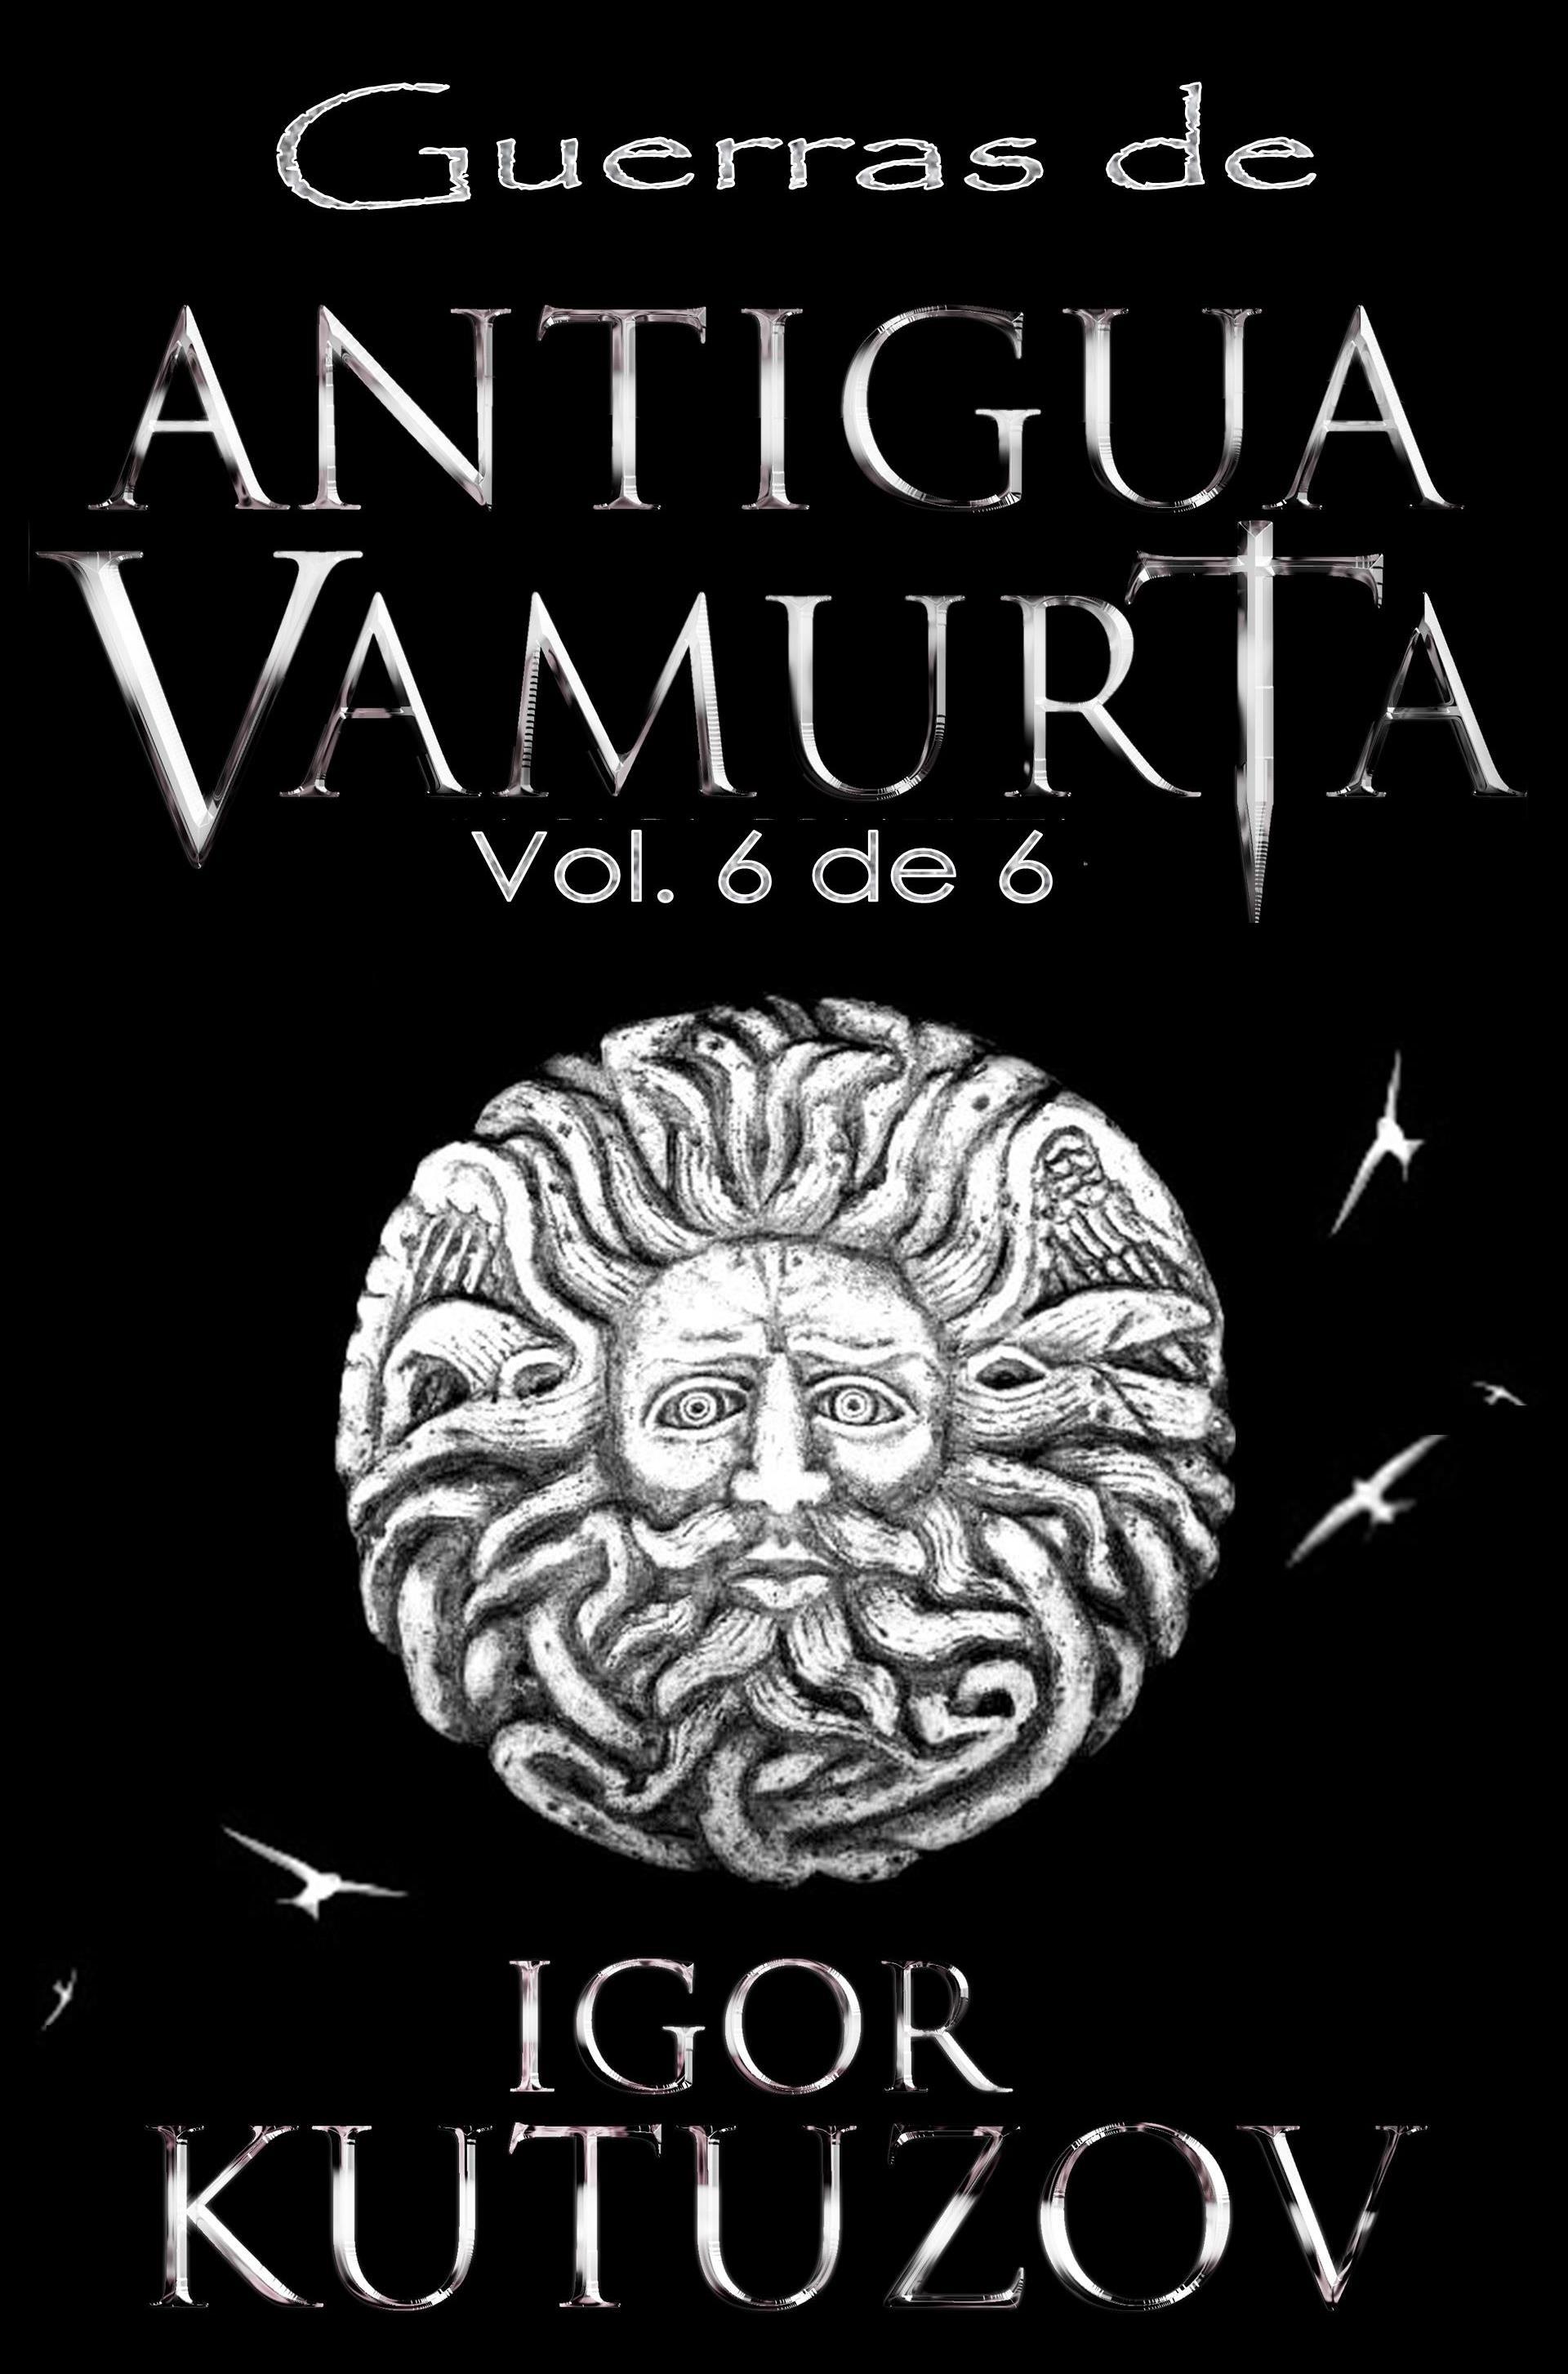 Guerras de Antigua Vamurta, Vol. 6